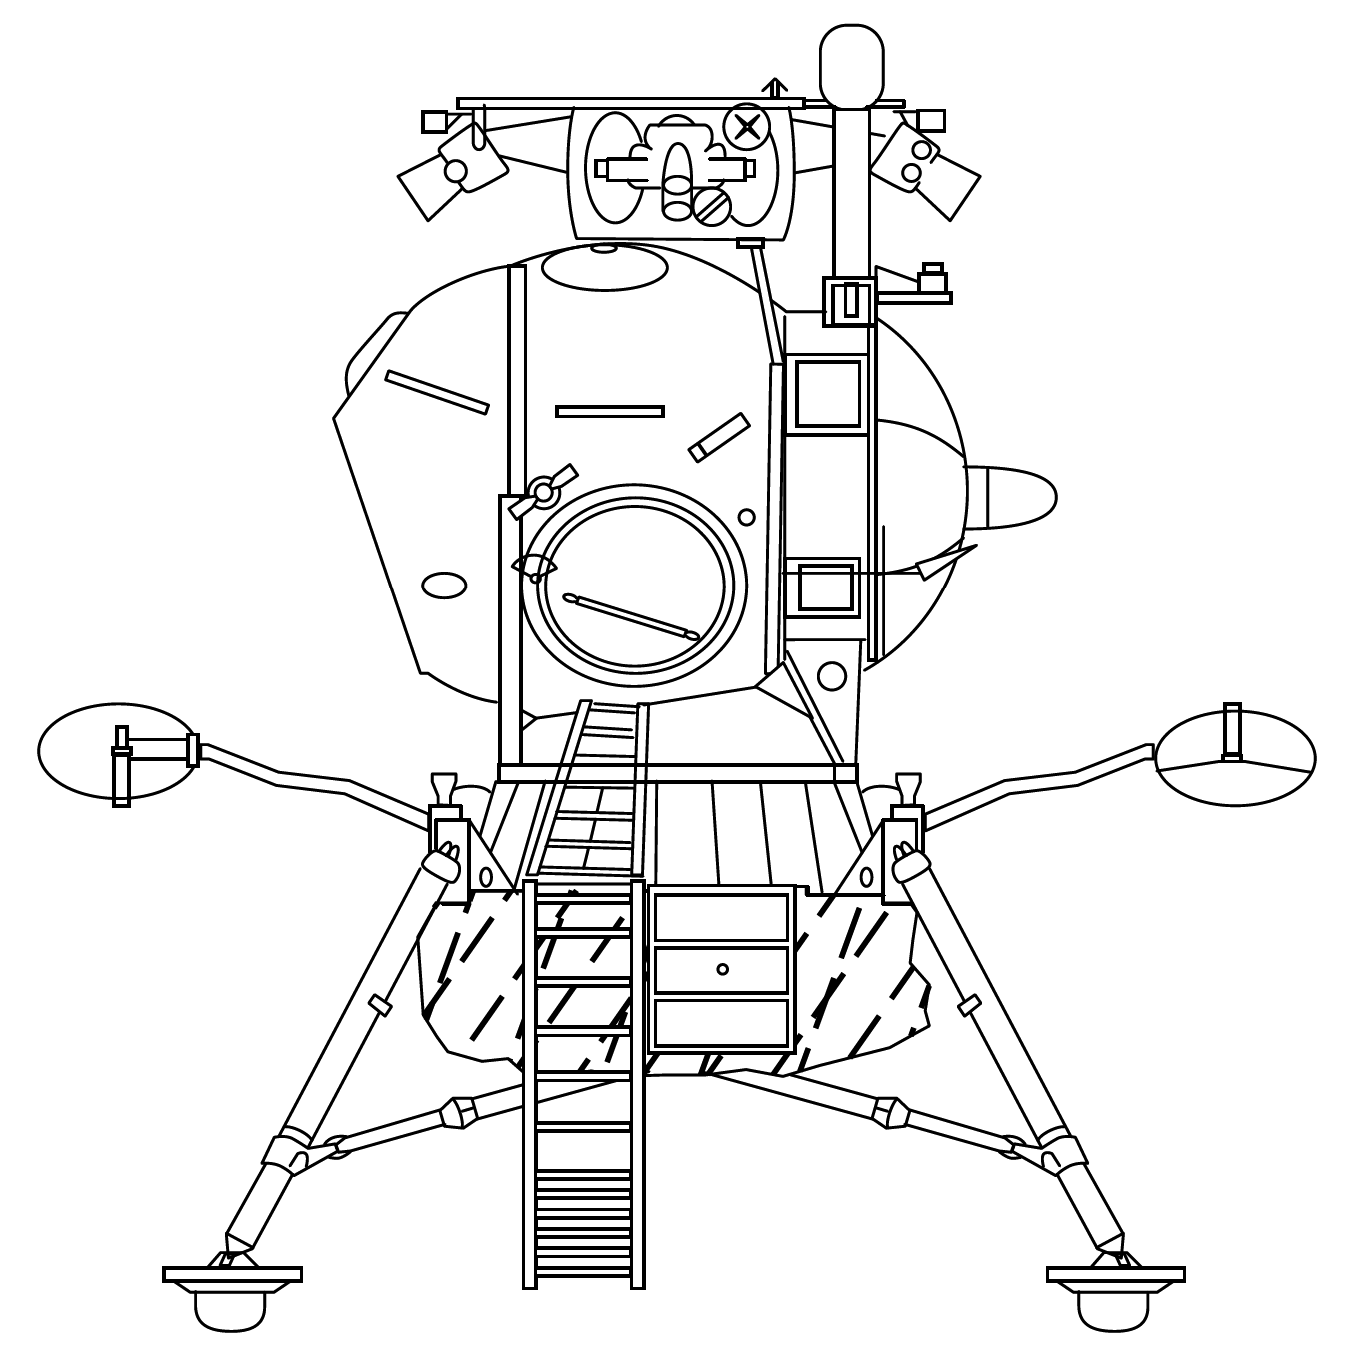 fichier soviet lunar lander drawing png  u2014 wikip u00e9dia